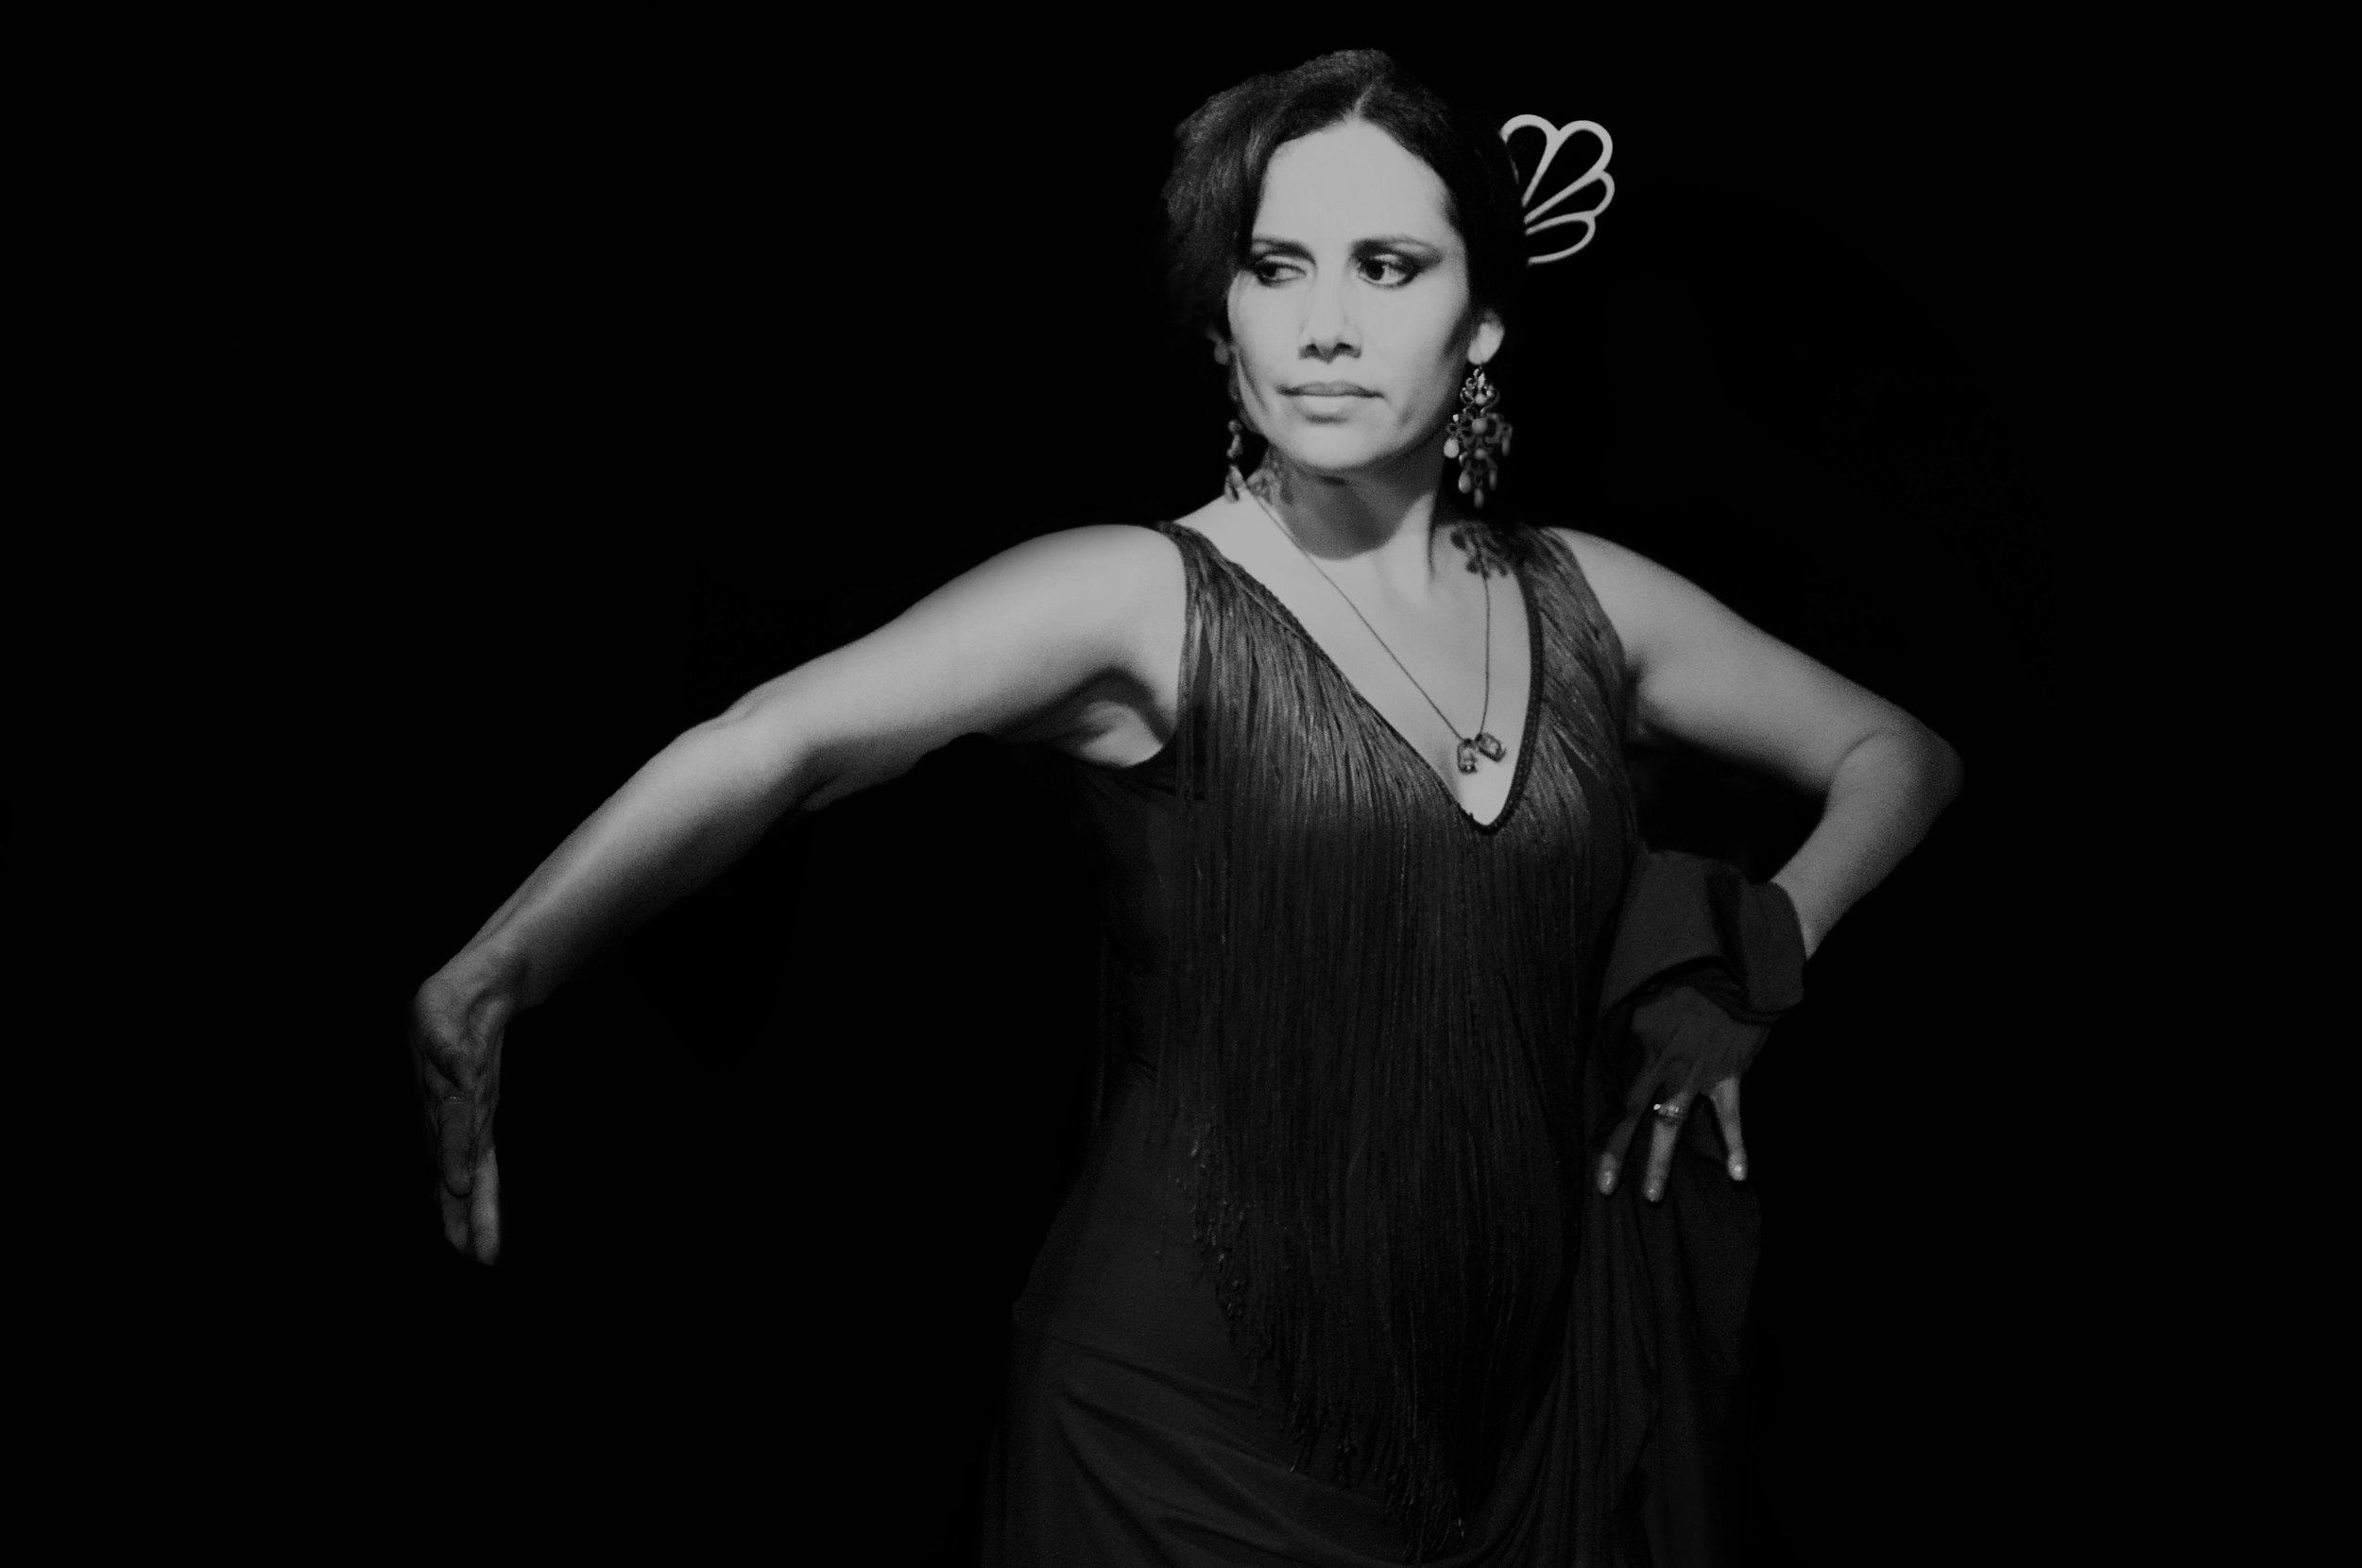 vanessa-12-08-2011-flamenco-33219 (2).jpg